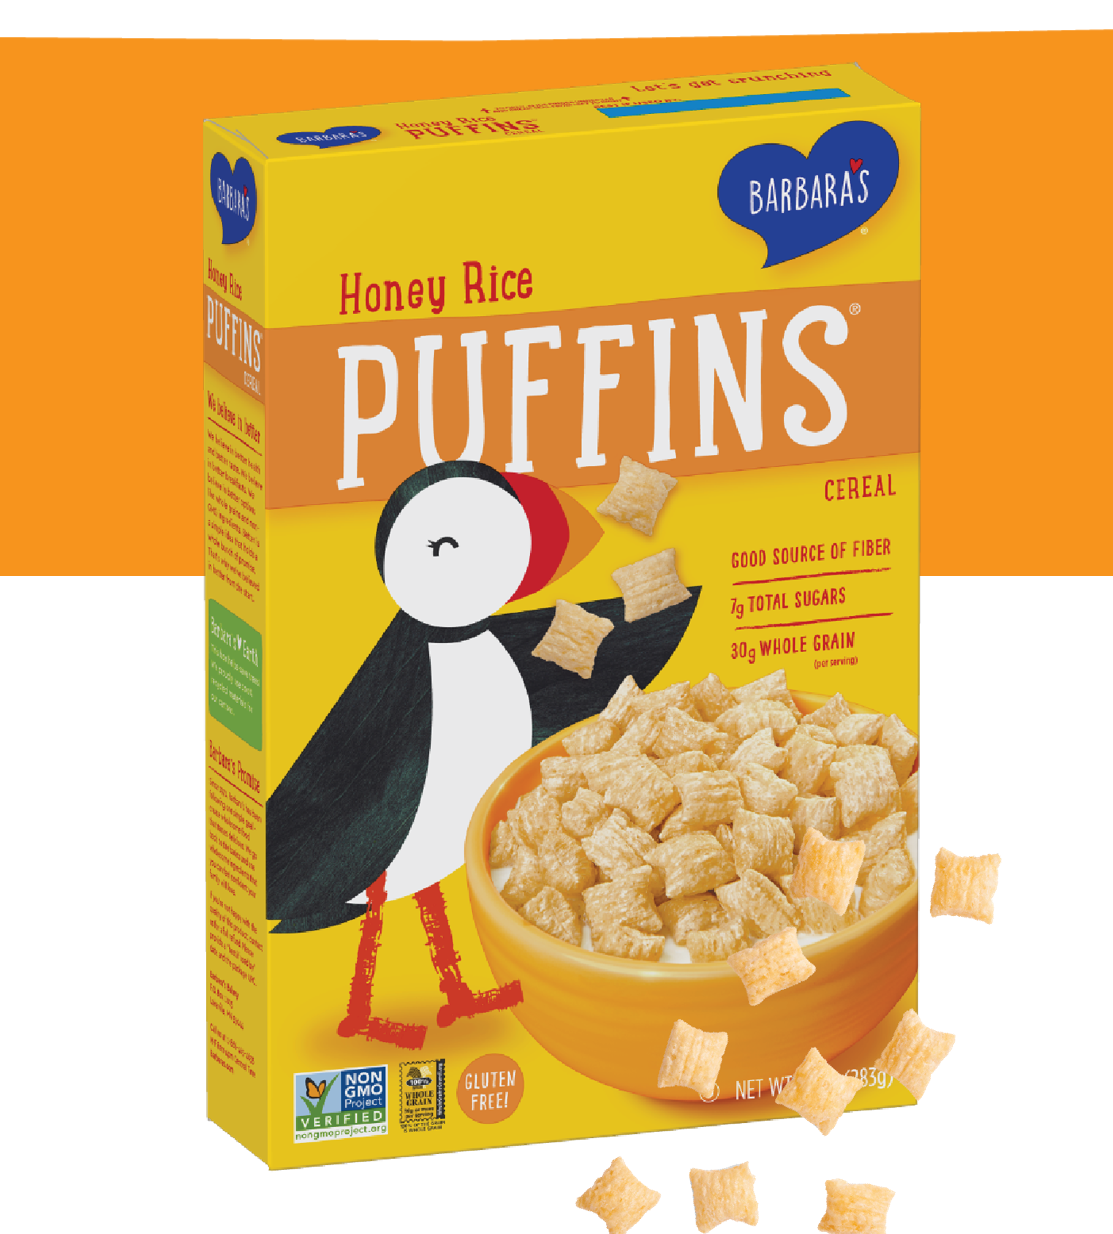 Gluten Free Cereal In 2020 Gluten Free Cereal Cereal Options Breakfast Cereal